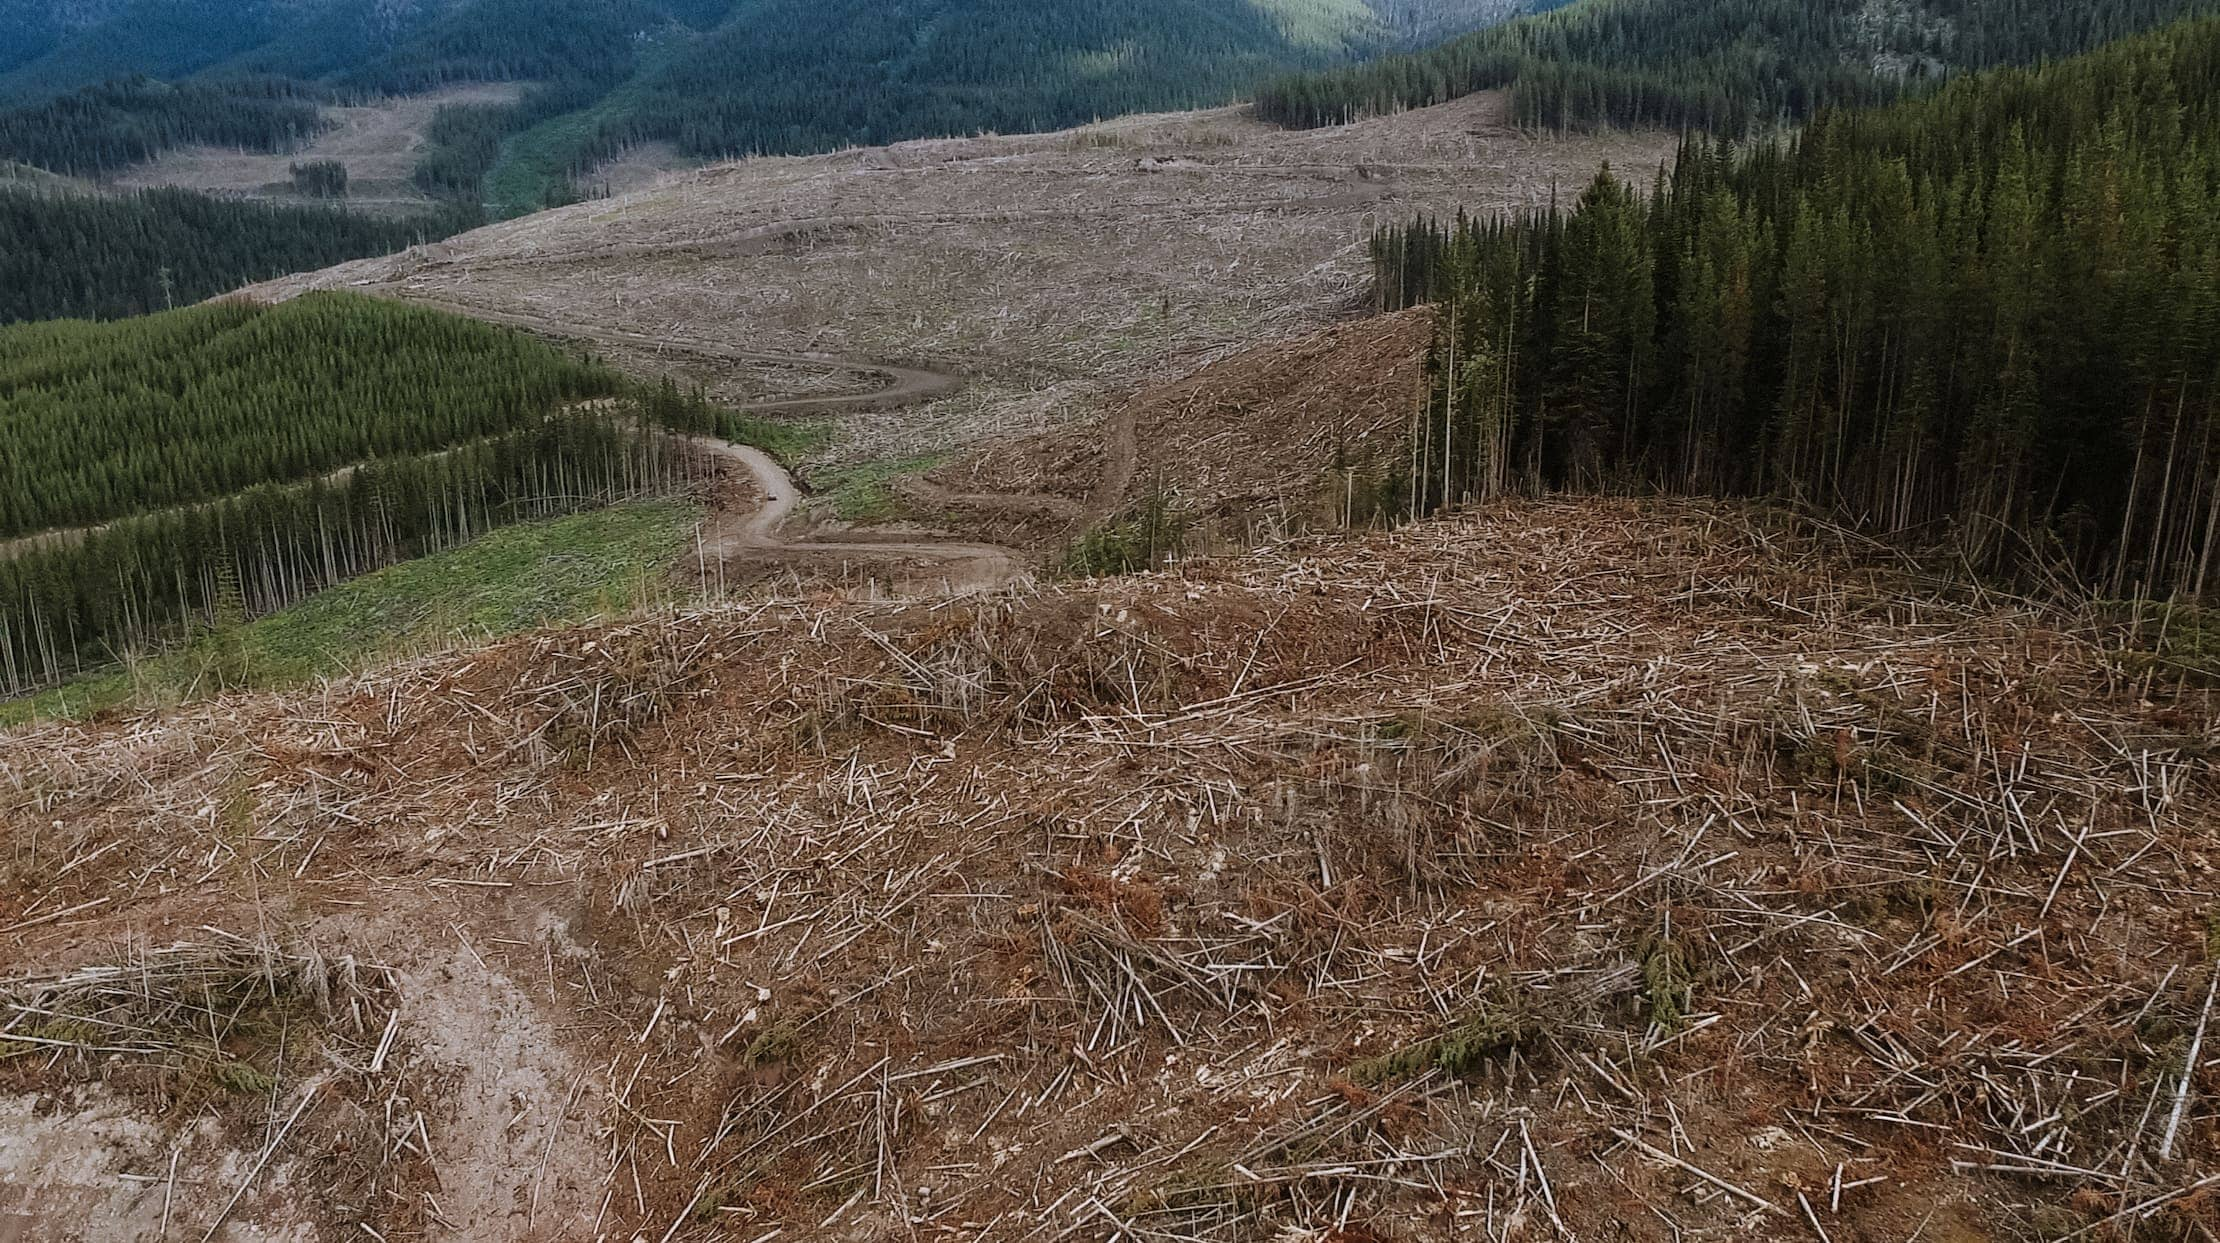 whitebark pine clearcut logging